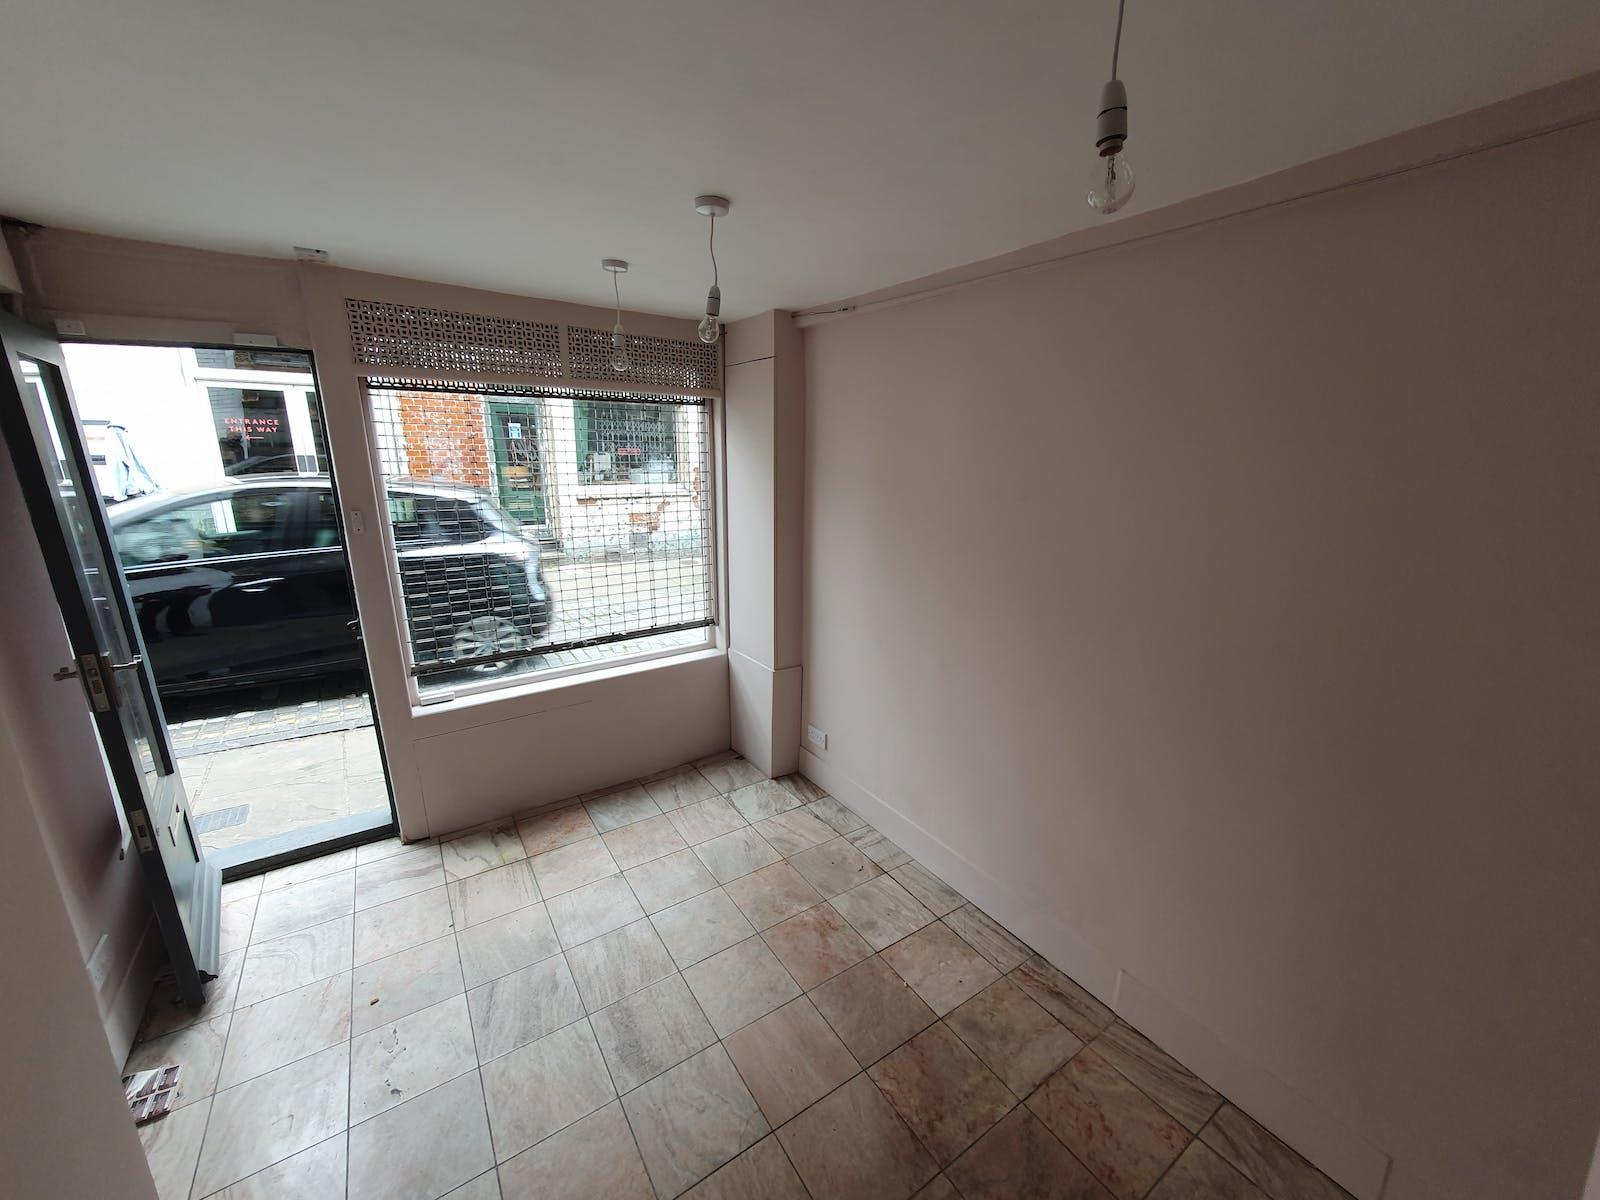 2 Charlton Place, London, Retail / Showroom To Let - 20210512_143108.jpg